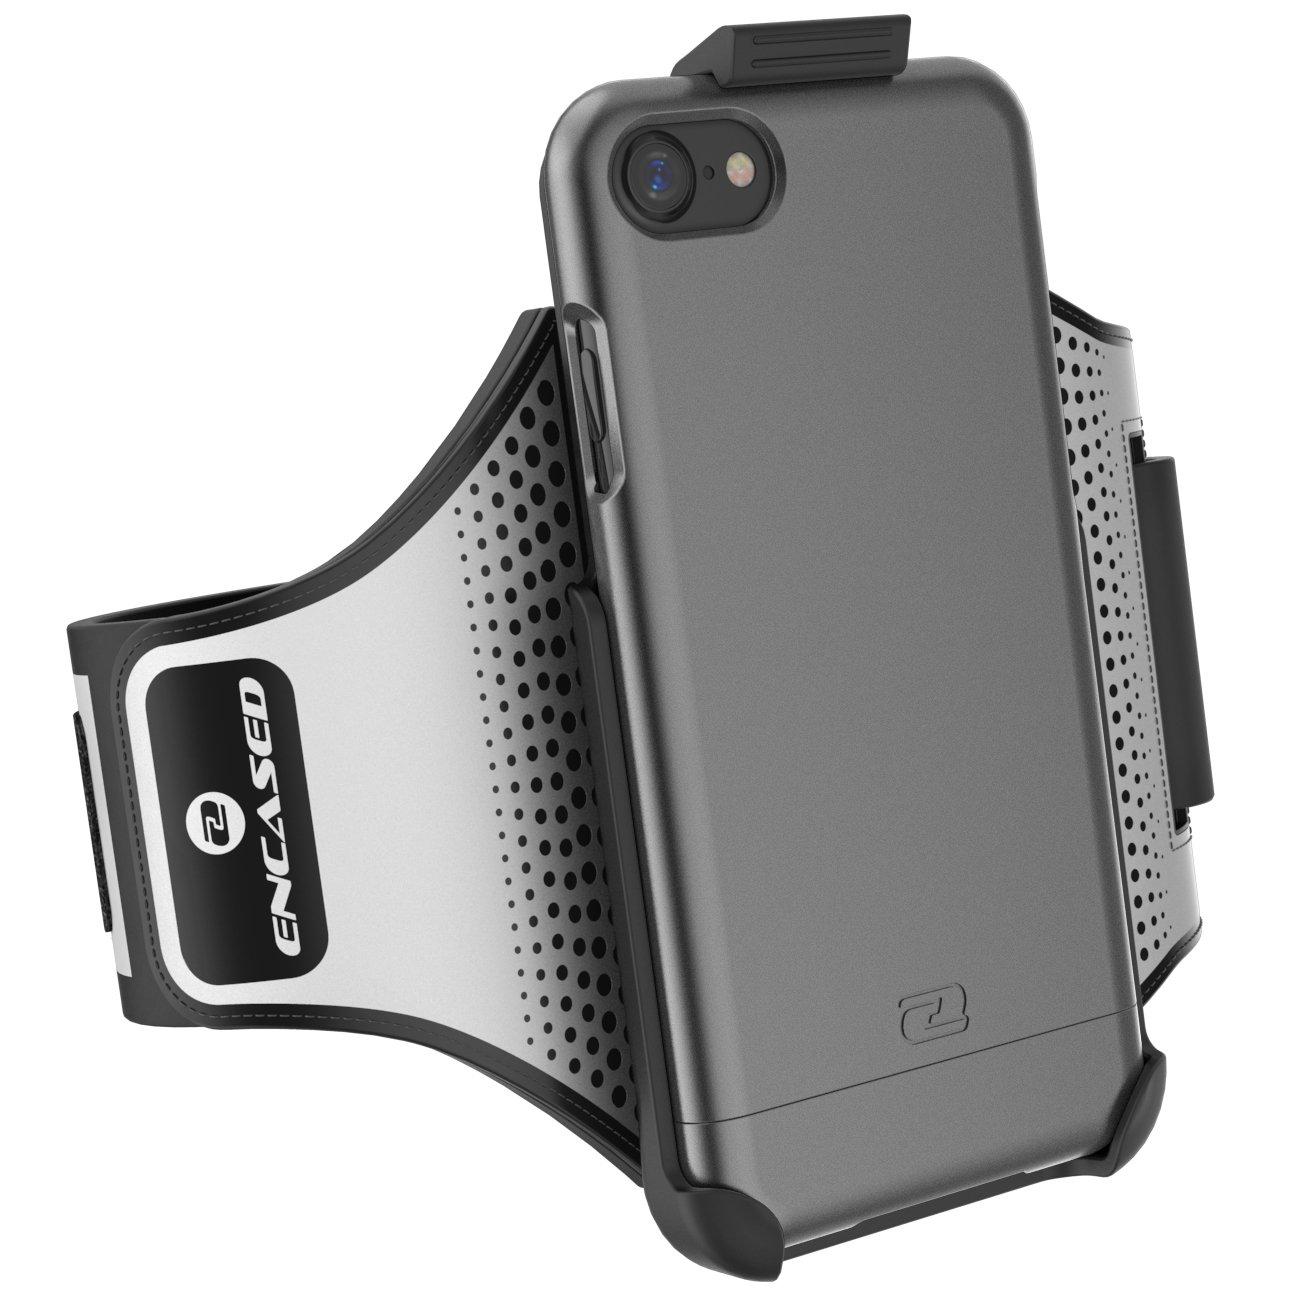 iPhone 7アームバンド&スポーツケース(2個セット)ケース入りClick-N-Goアームバンド(ハイブリッドカバー付き)(メタリックグレー)   B01M10TWKM